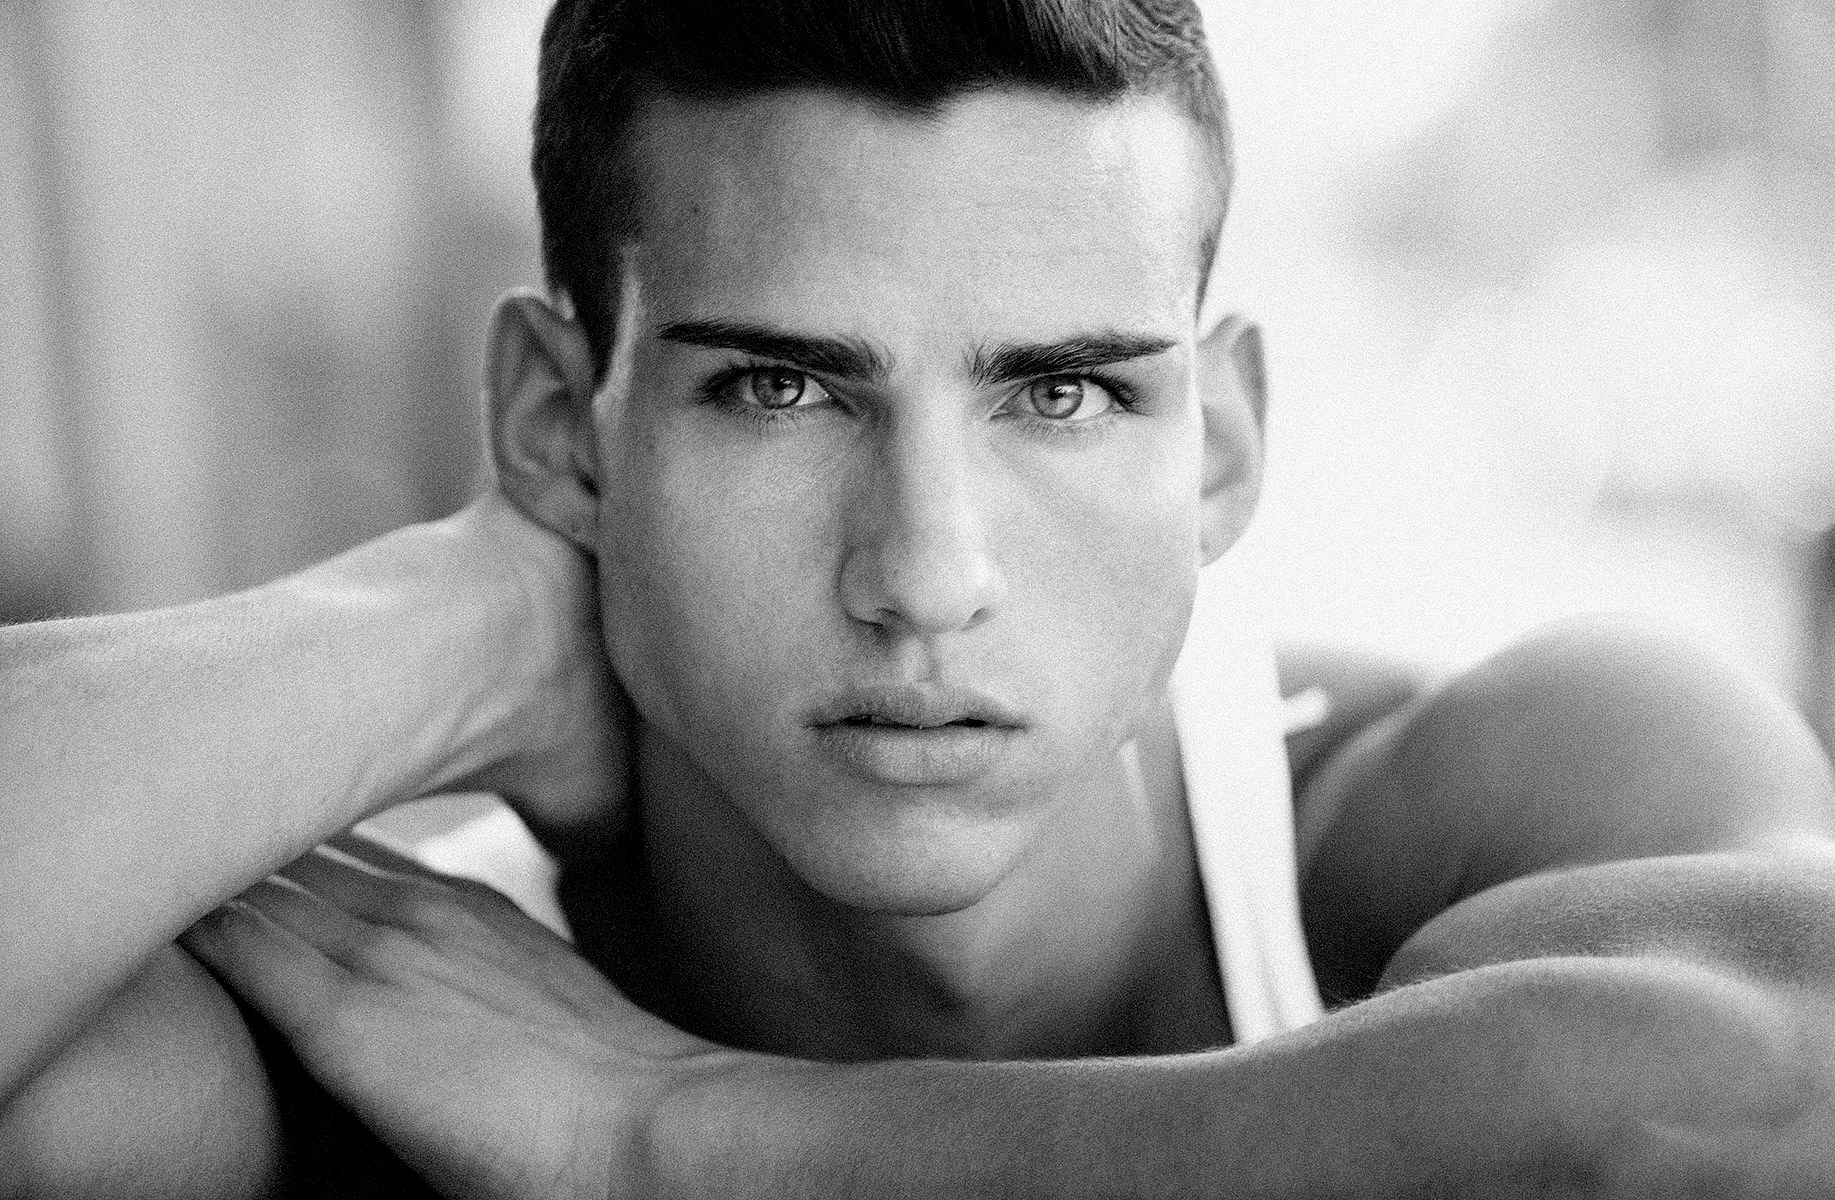 new-mexico-albuquerque-male-models-men-6.jpg